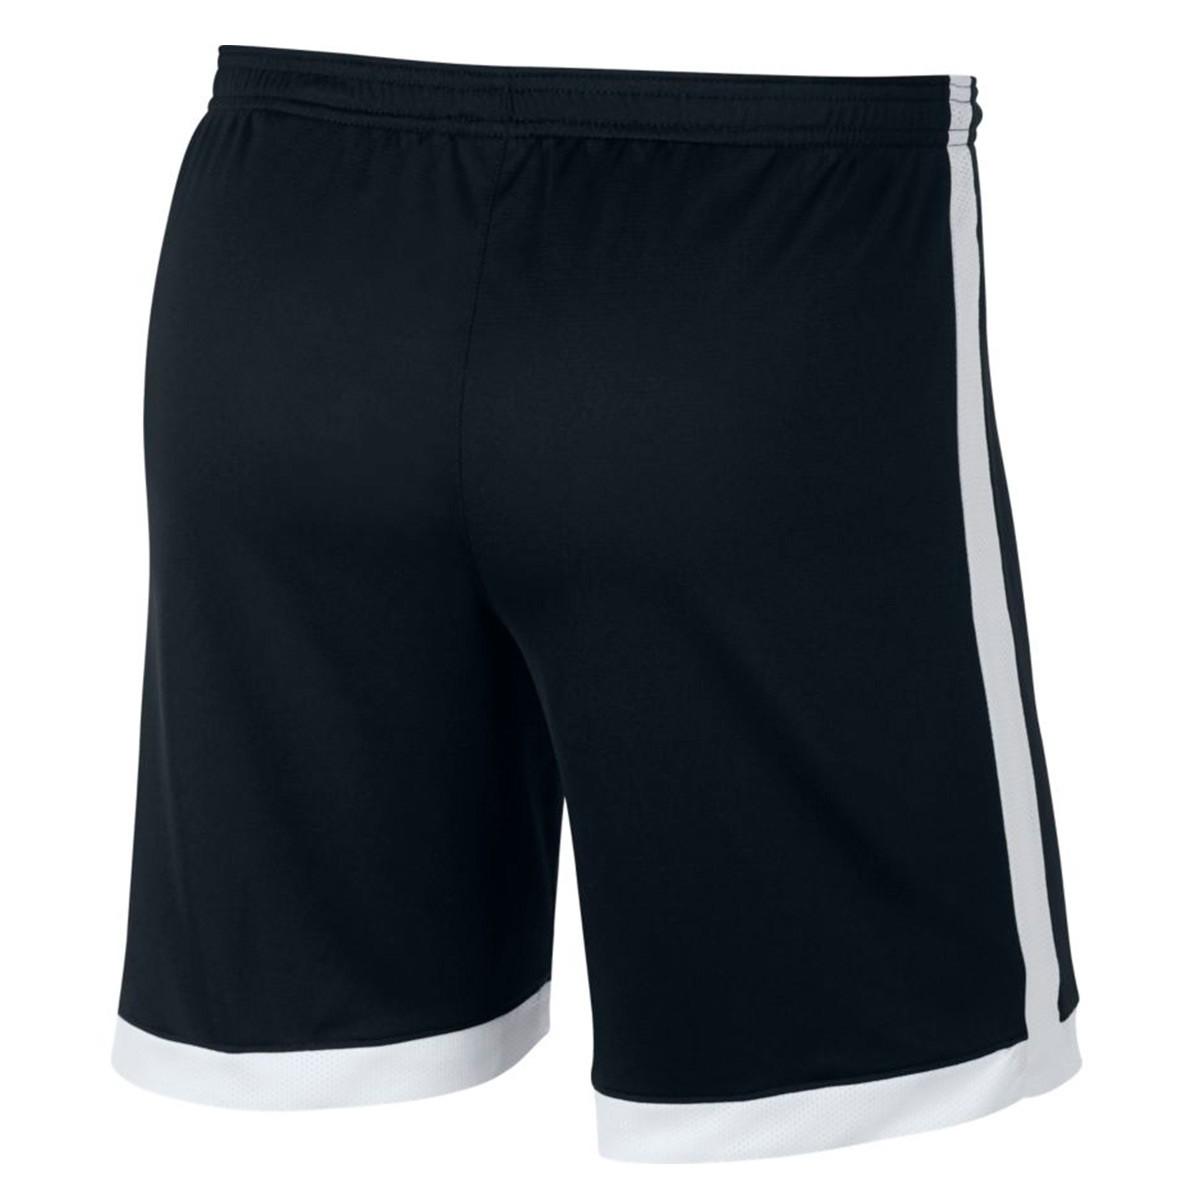 c20c3e76a7264 Shorts Nike Dri-FIT Academy Black-White - Football store Fútbol Emotion